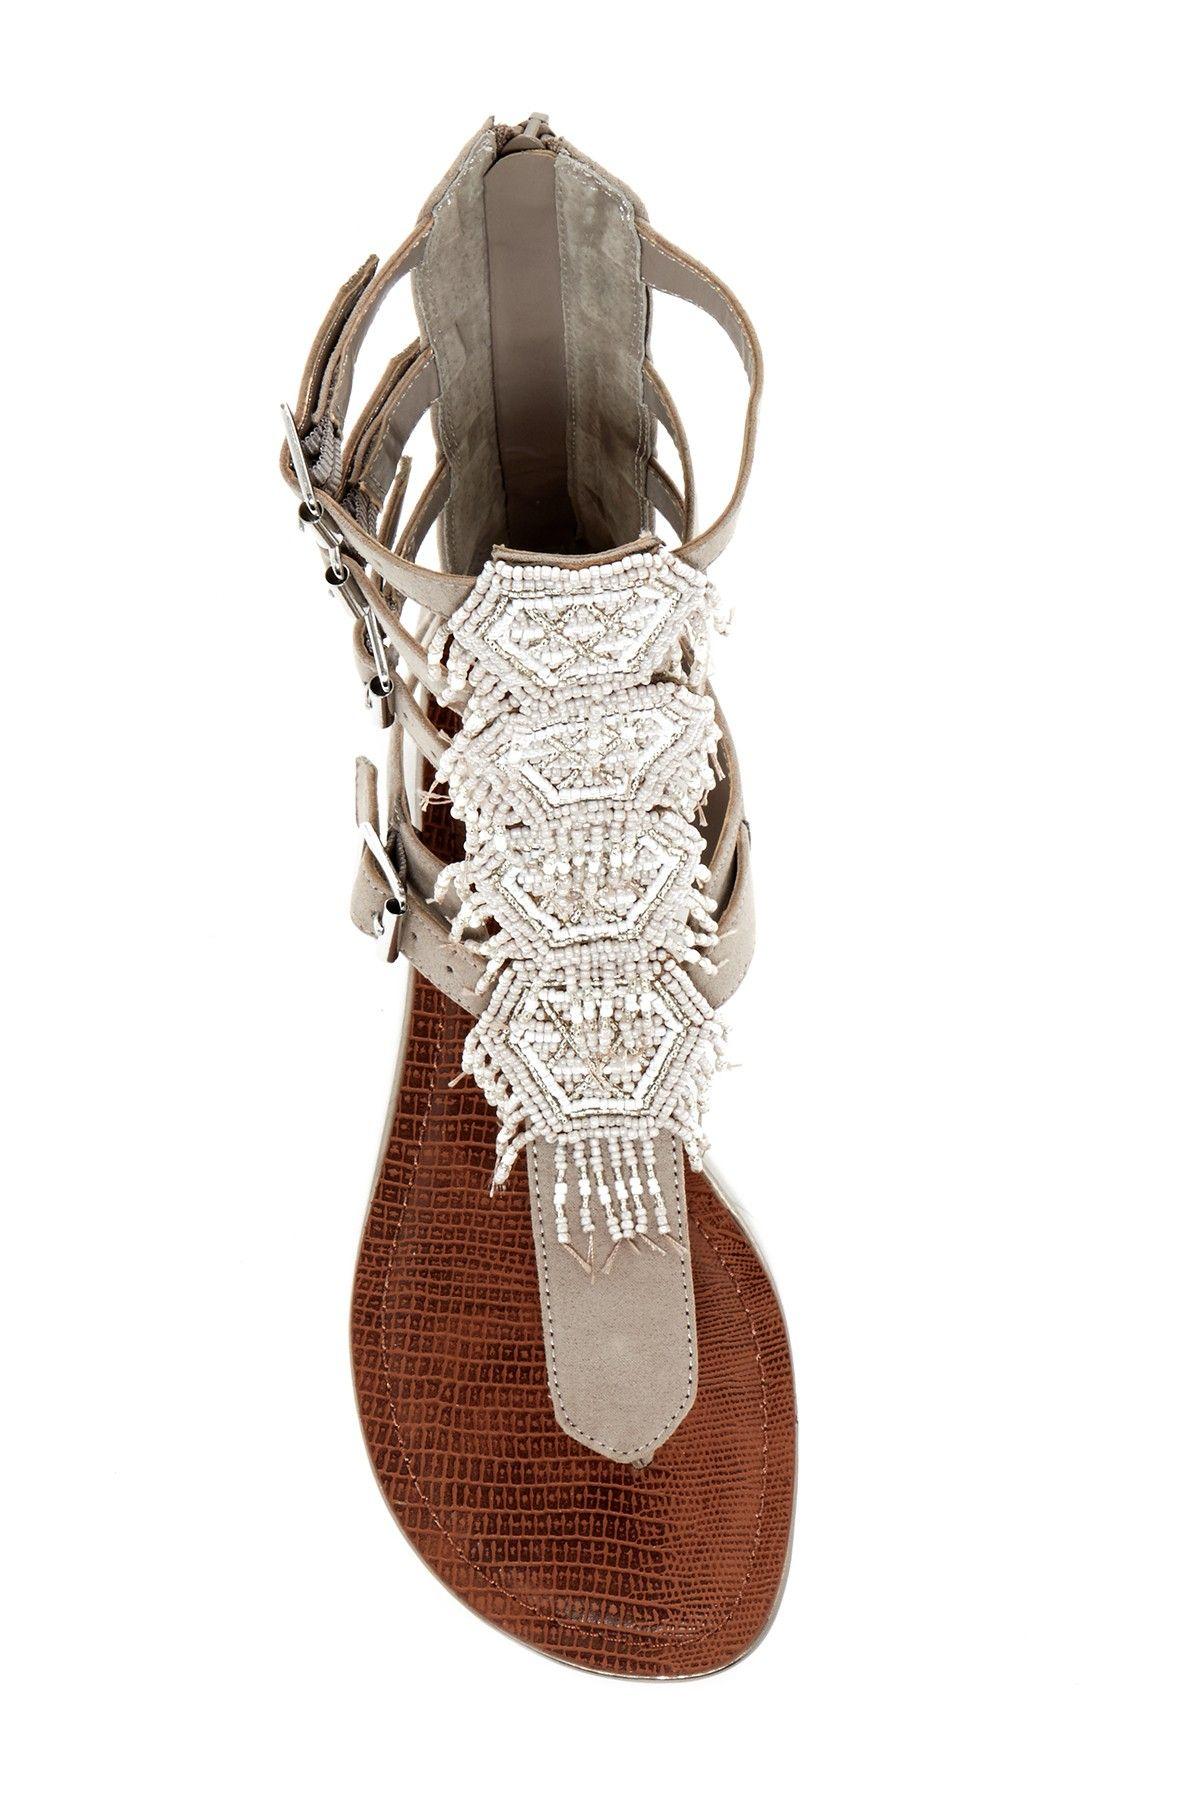 Taos Beaded Gladiator Sandal by Carlos By Carlos Santana on  HauteLook